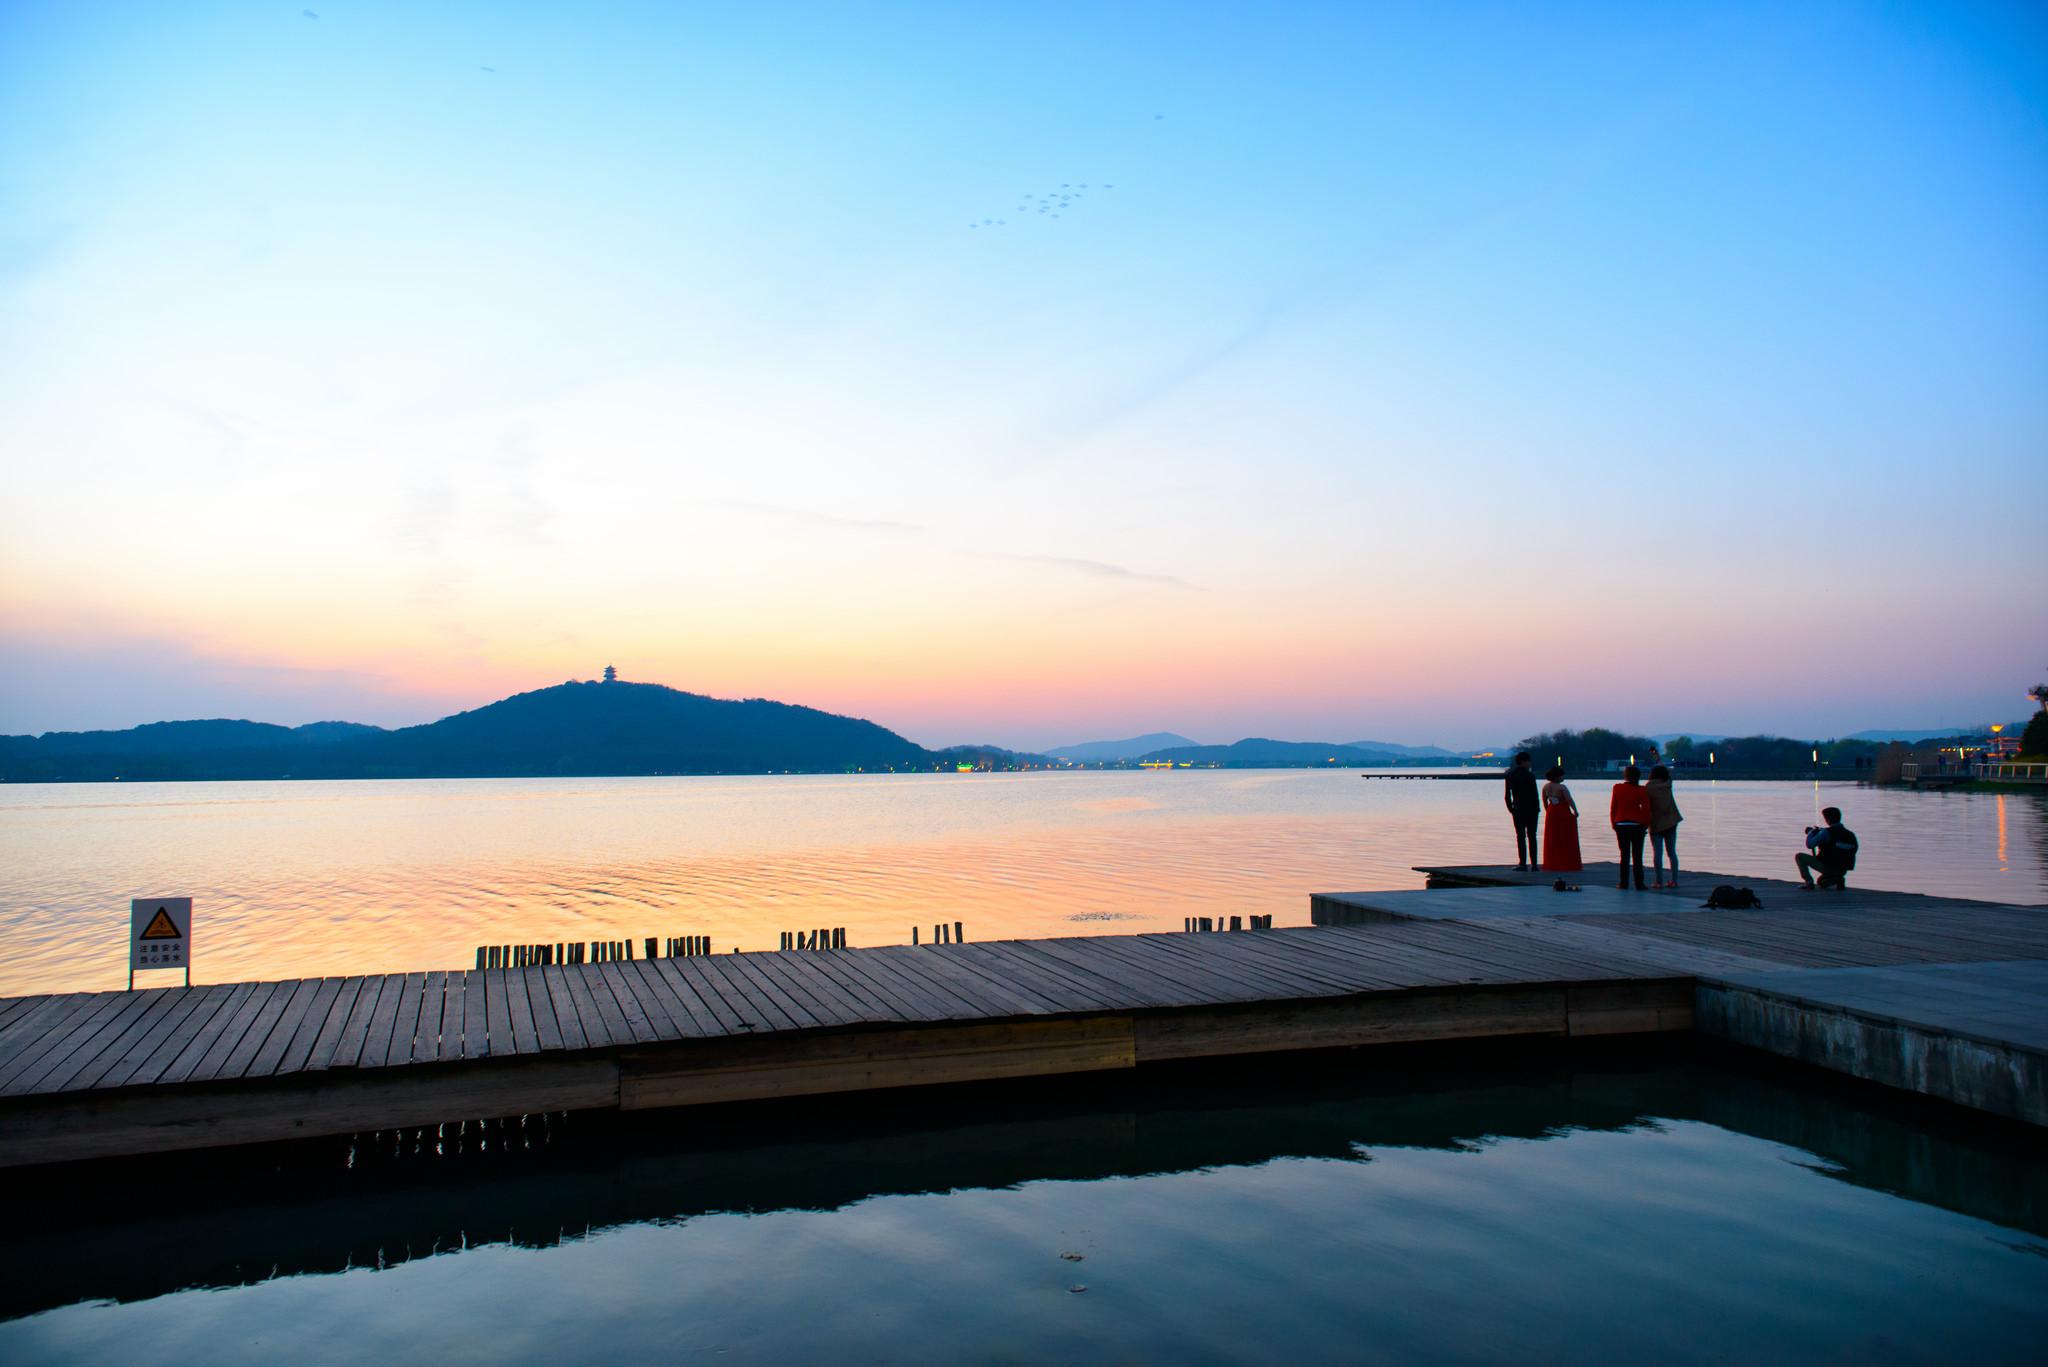 Озеро Тайху, Китай